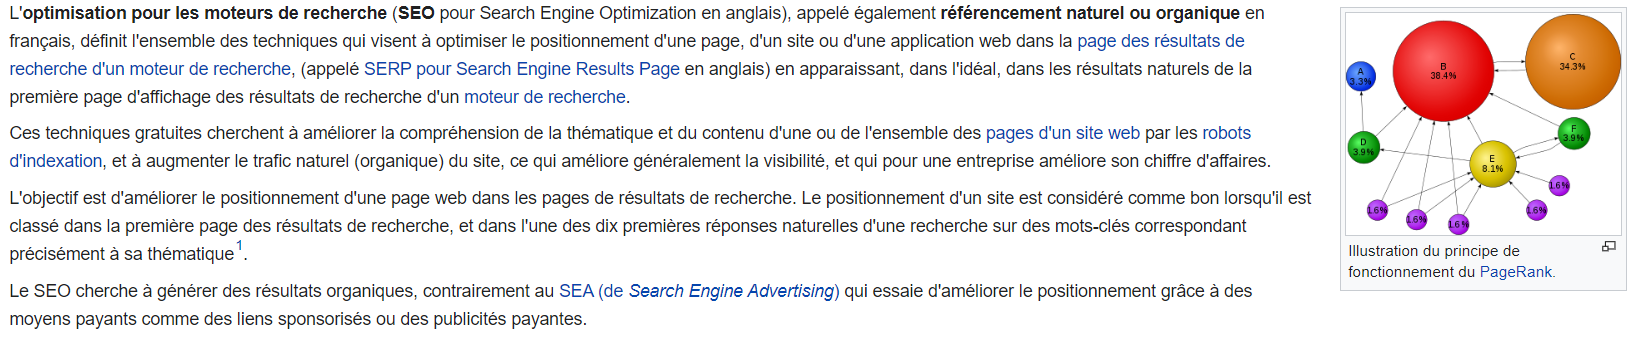 definition-seo-wikipedia